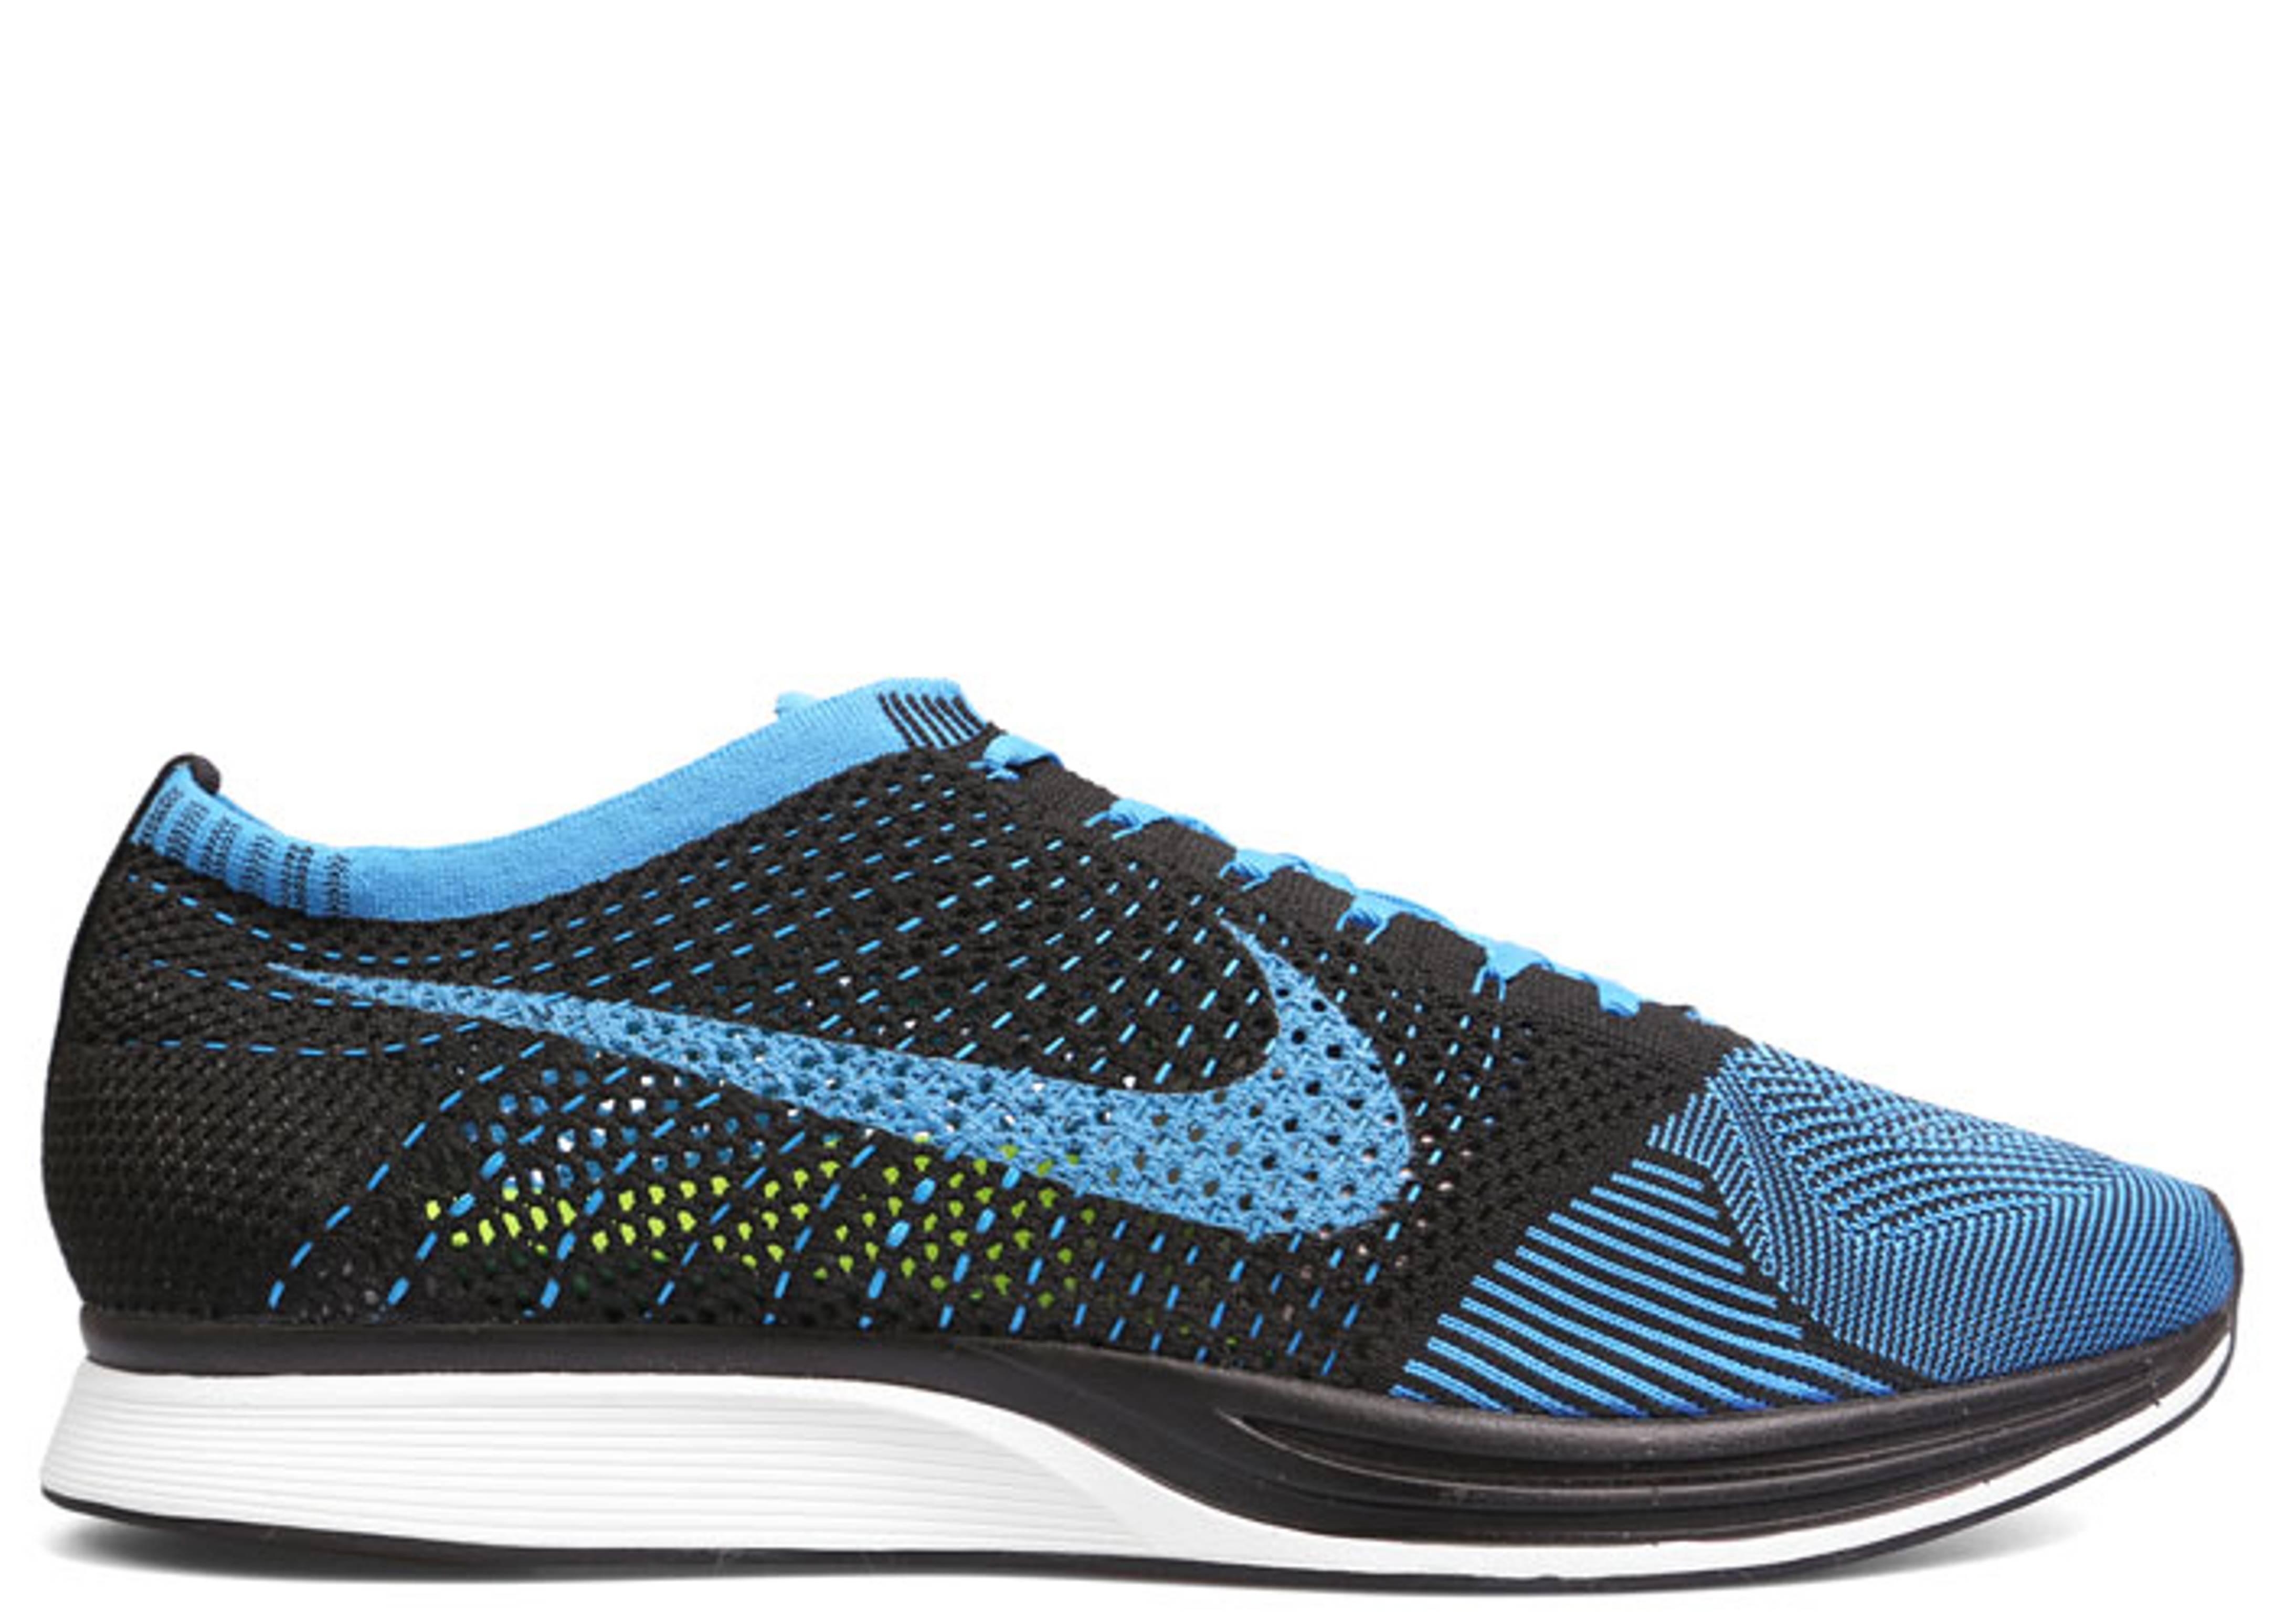 899985aea84e Flyknit Racer - Nike - 526628 001 - black photo blue white